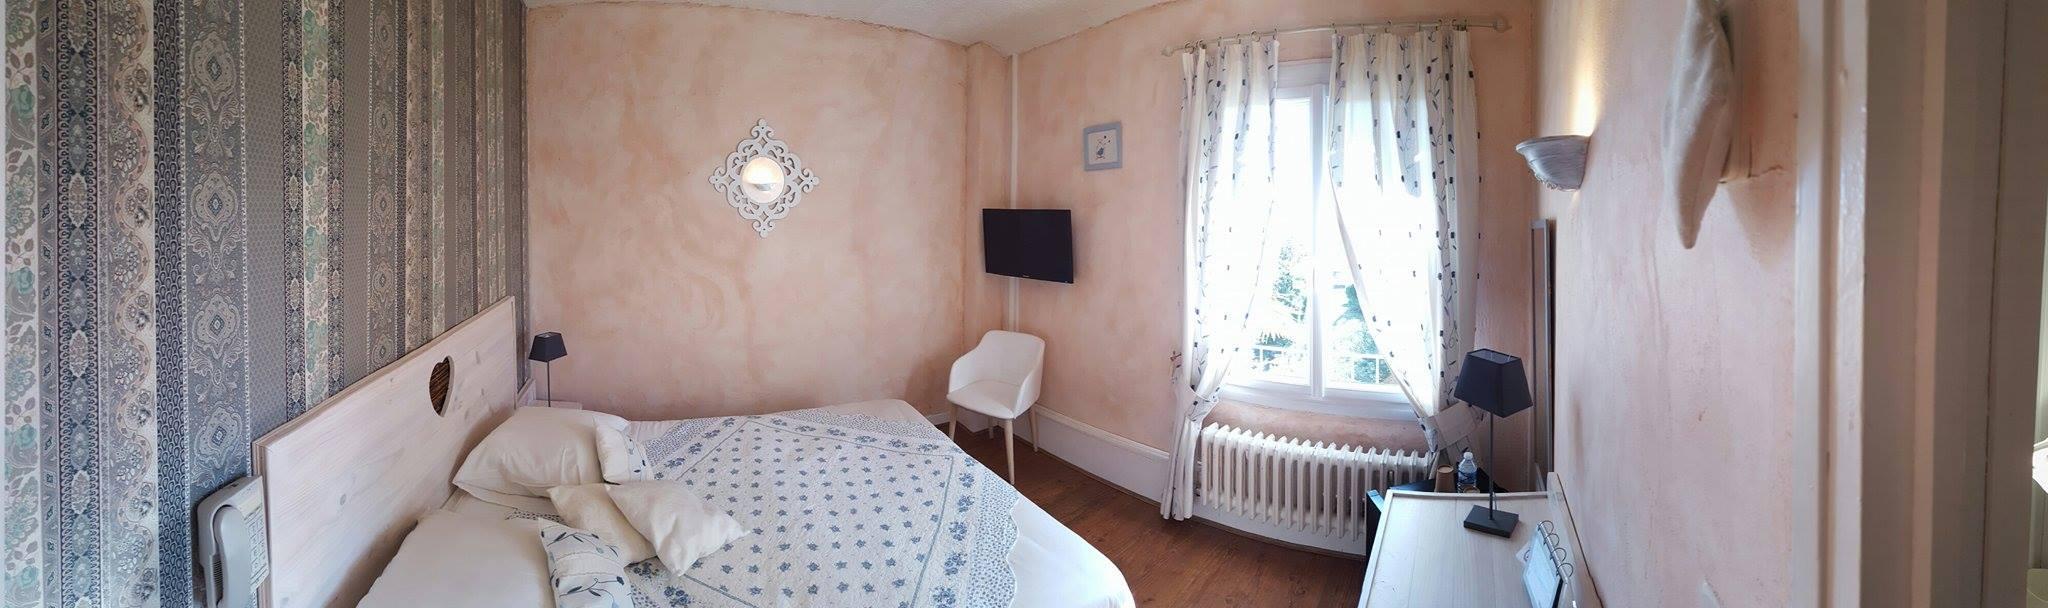 Chambre Provençale Standard grand lit